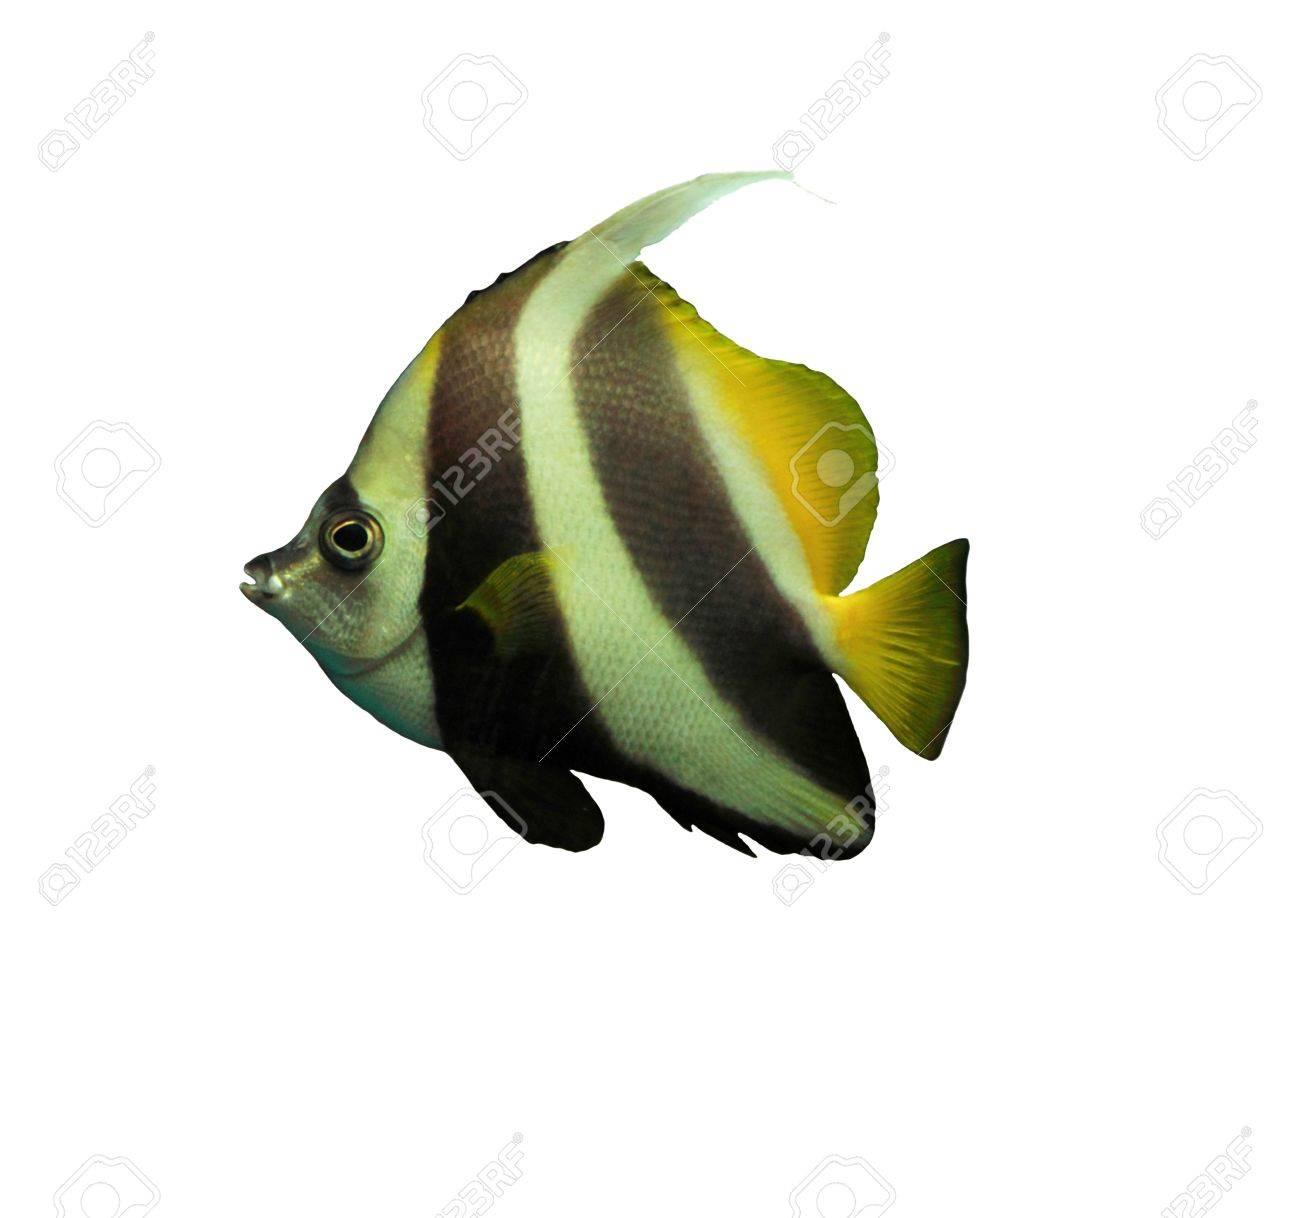 Tropical fish Stock Photo - 16602027